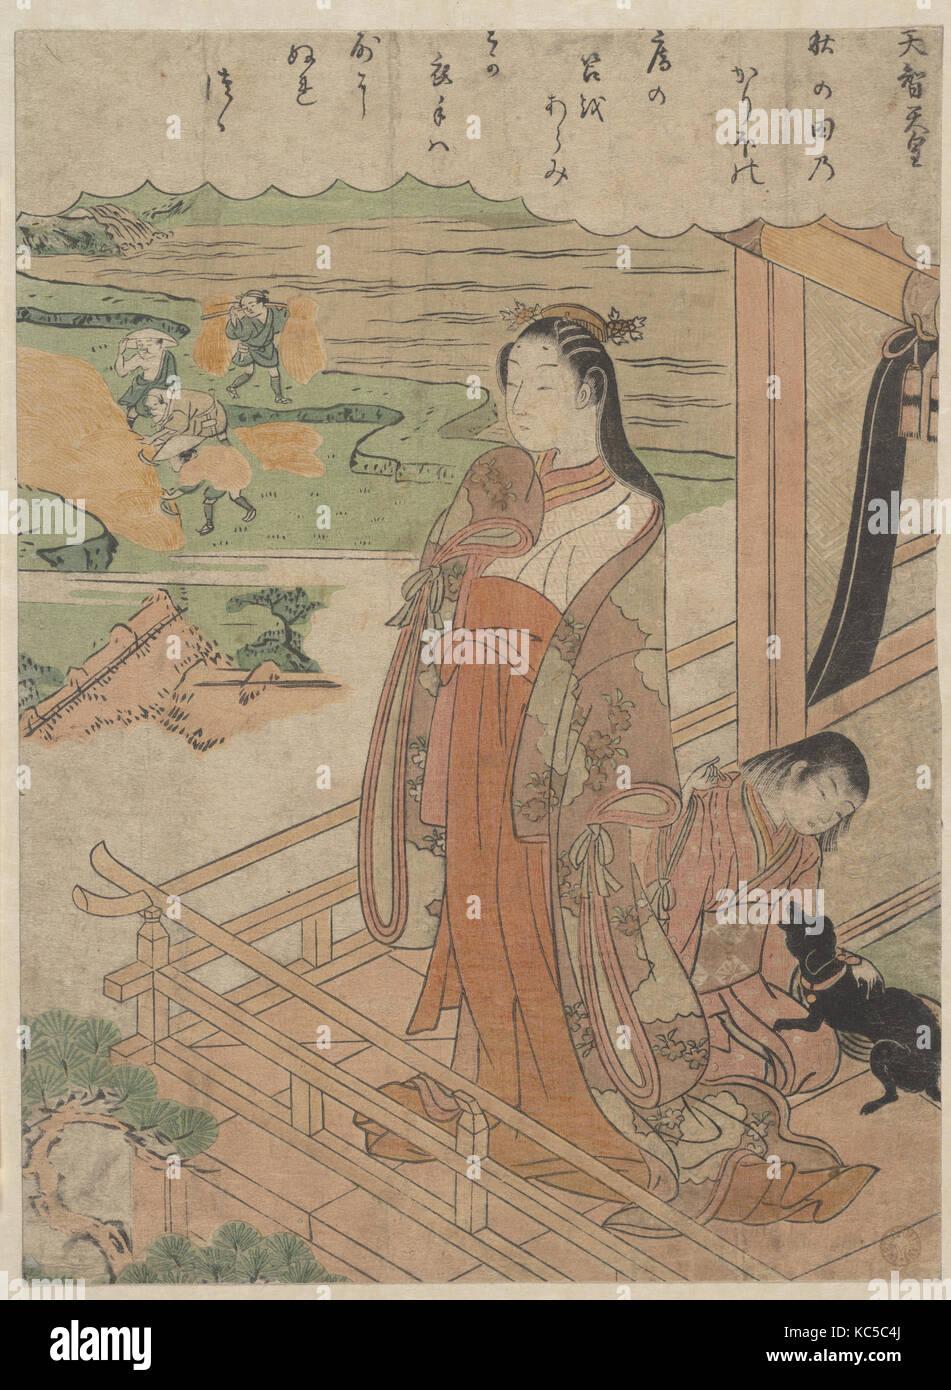 天智天皇 百人一首, simpatía, del período Edo (1615-1868), ca. 1768, Japón, grabado en madera policromada; Imagen De Stock